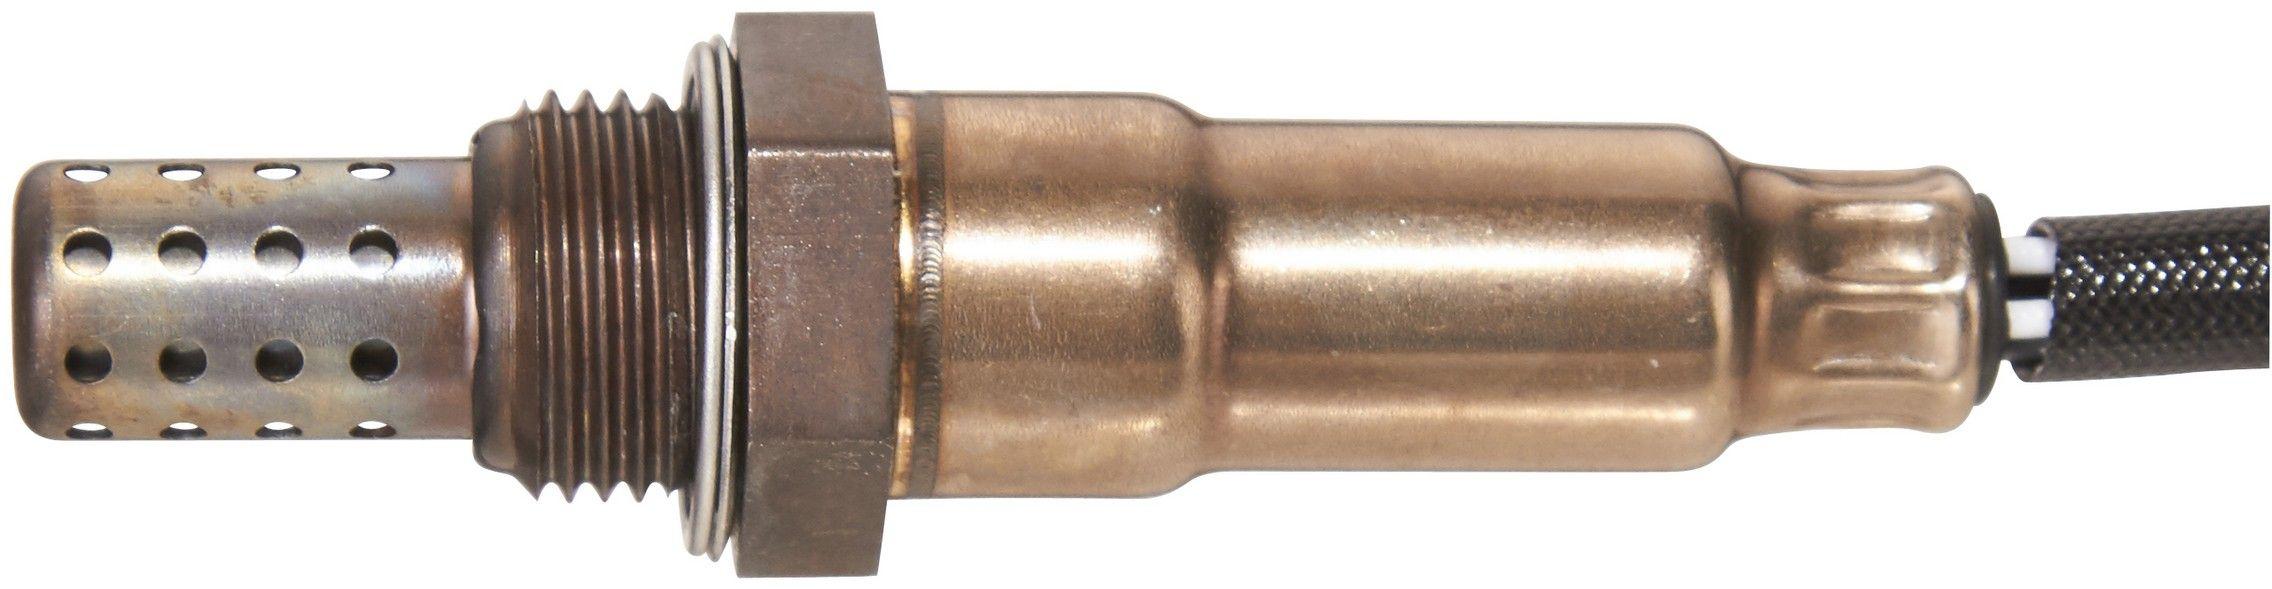 Audi A3 Oxygen Sensor Replacement (Bosch, Delphi, Denso, NGK